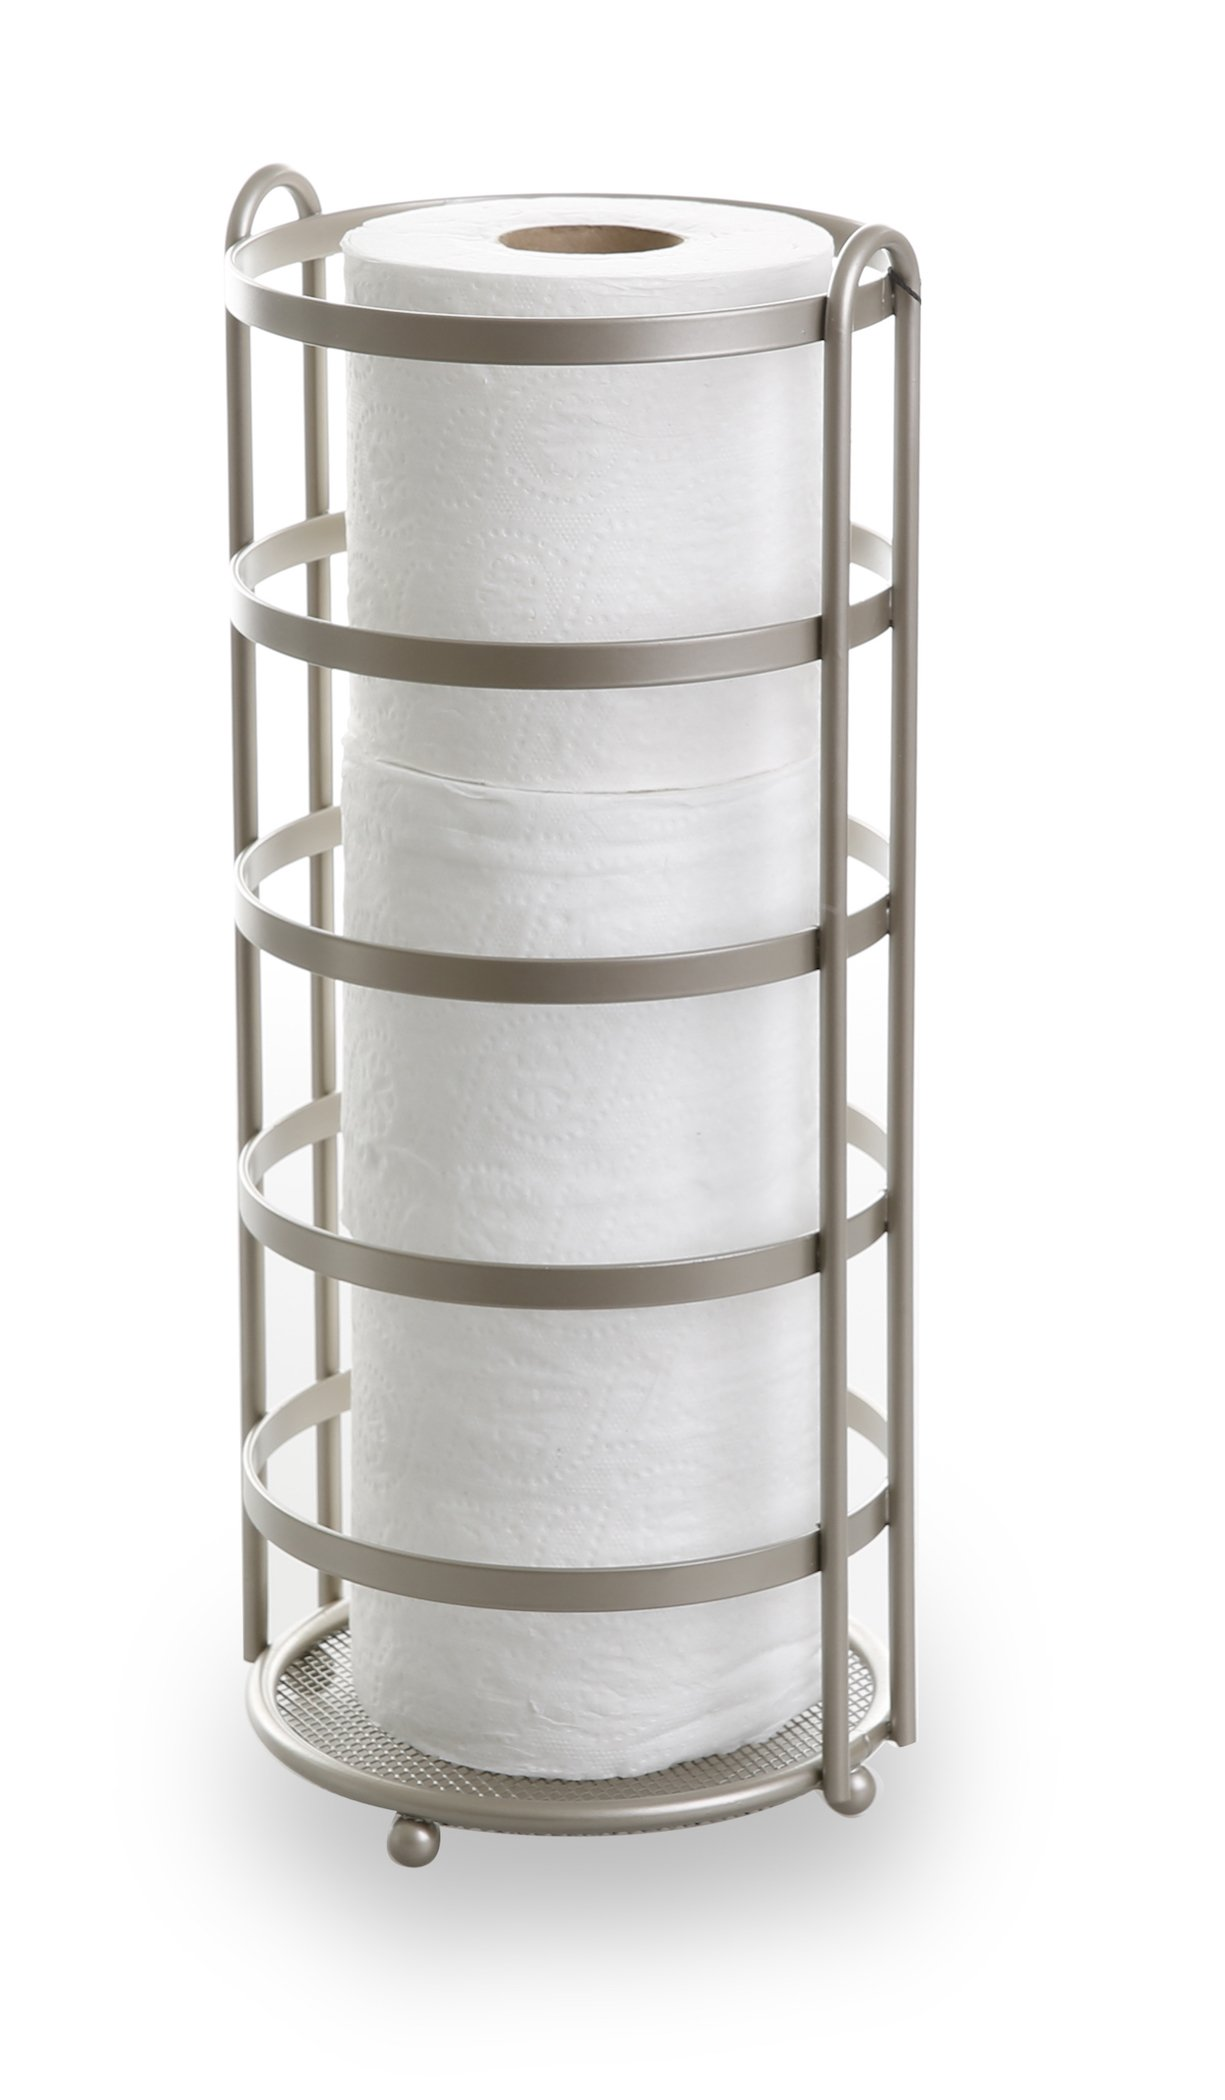 BINO 'Lafayette' Toilet Paper Reserve, Nickel by BINO